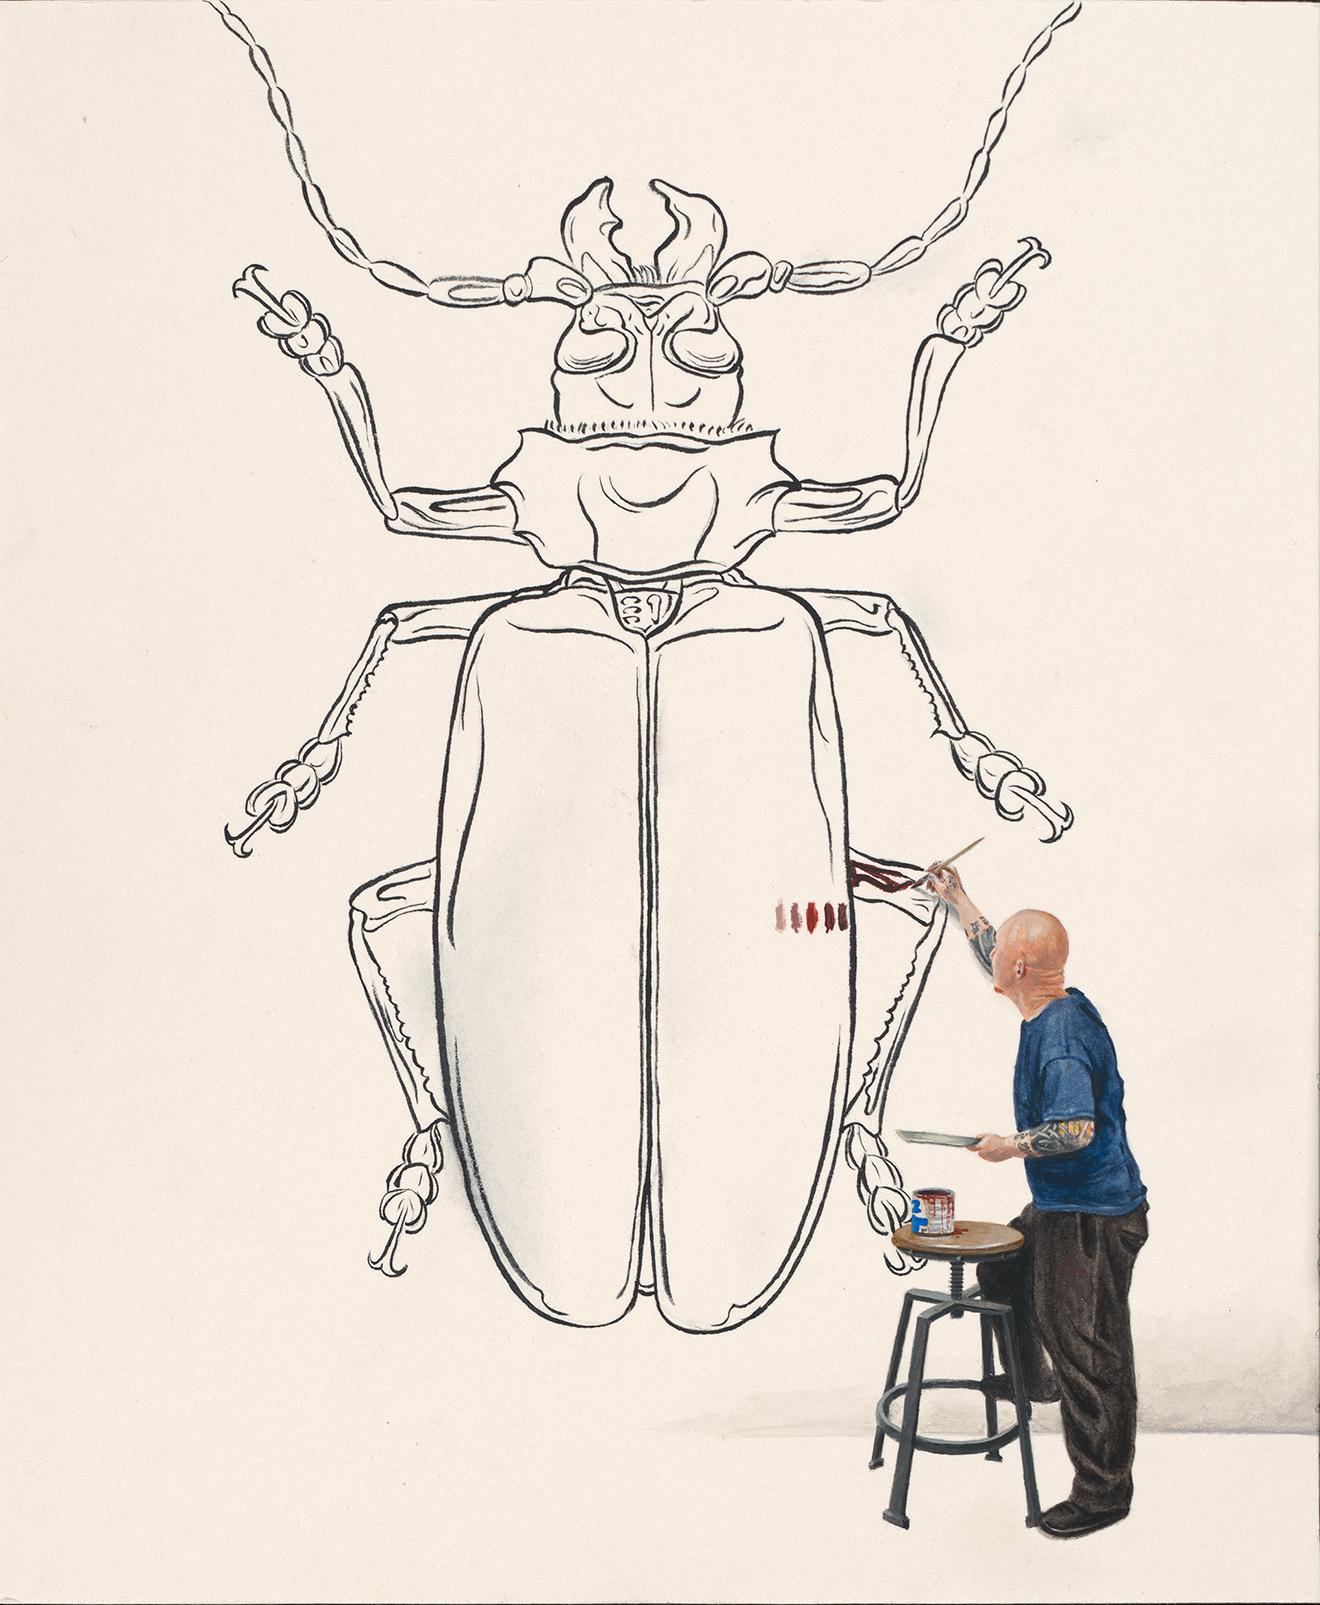 "Evan Skrederstu.  Titanus.  2014 - acrylic on board, 12"" x 10""."